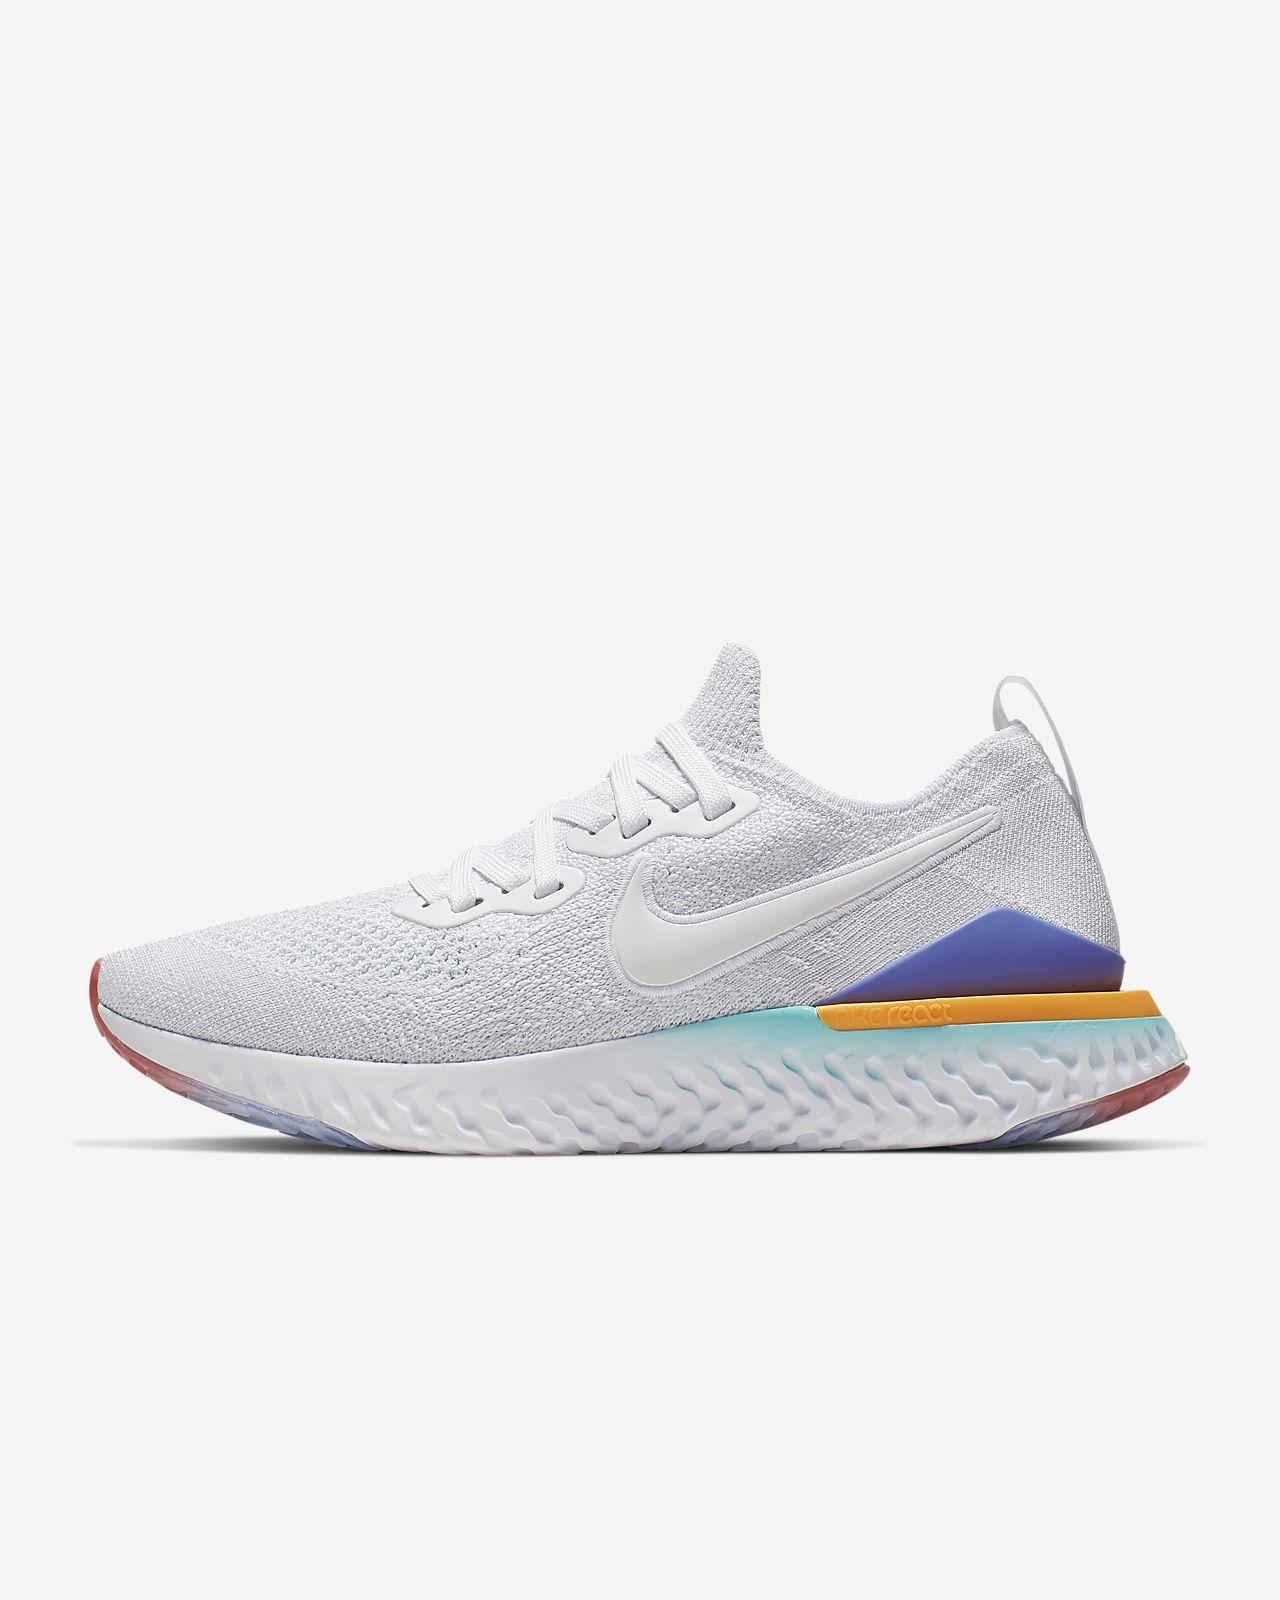 factory price 8a252 b2d3f ... Nike Epic React Flyknit 2 Damen-Laufschuh